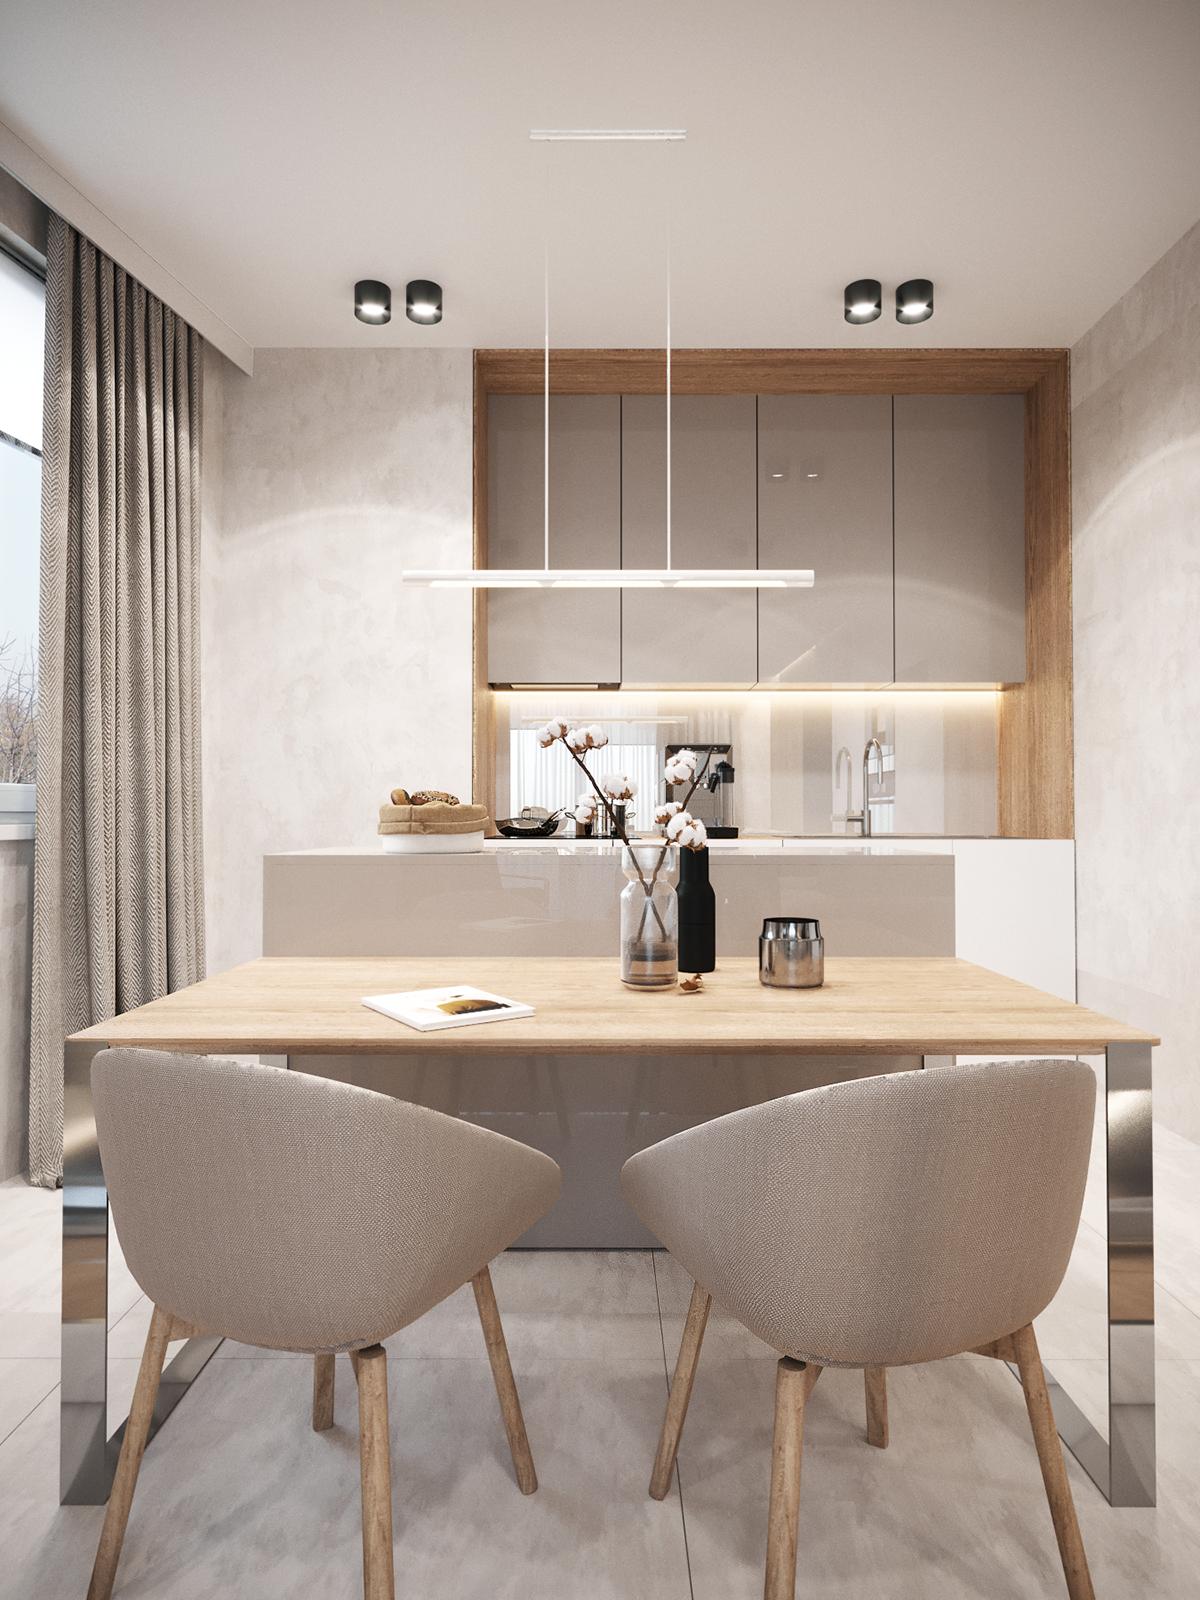 Warsaw cream apartment 48,7 sq.m on Behance Сучасні